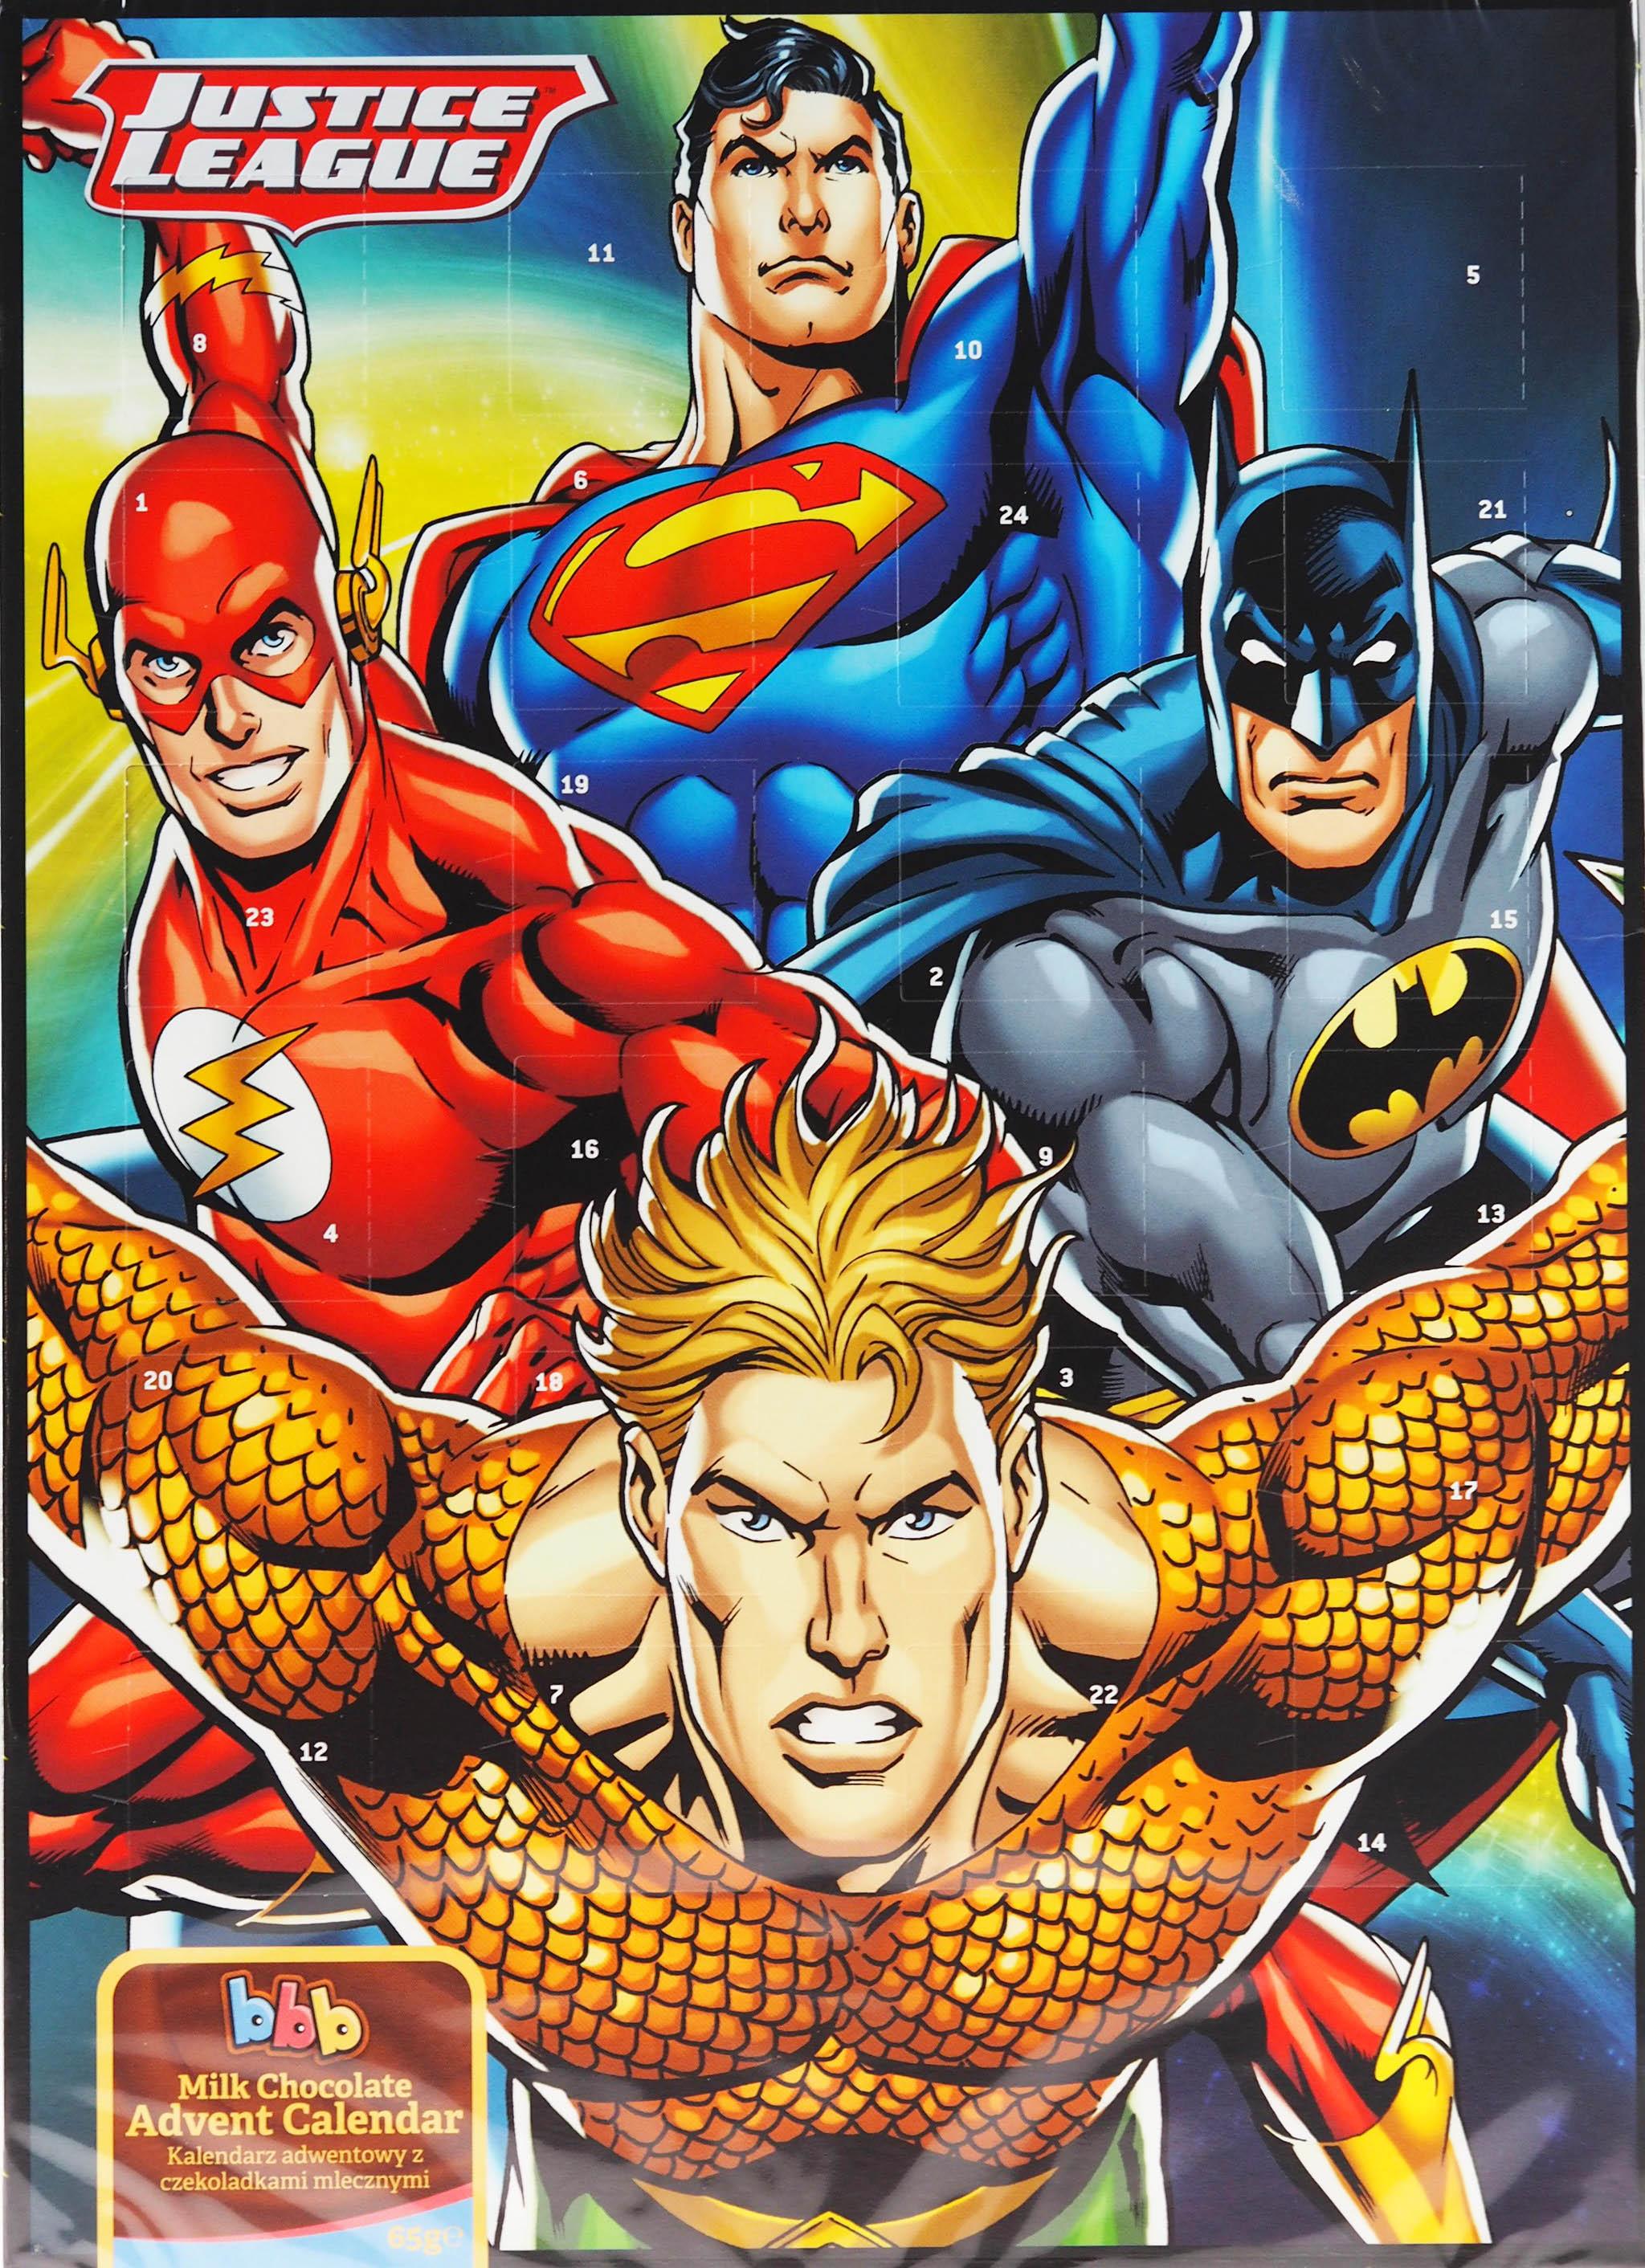 Justice League Christmas Chocolate Advent Calendar 5056086521323 | eBay